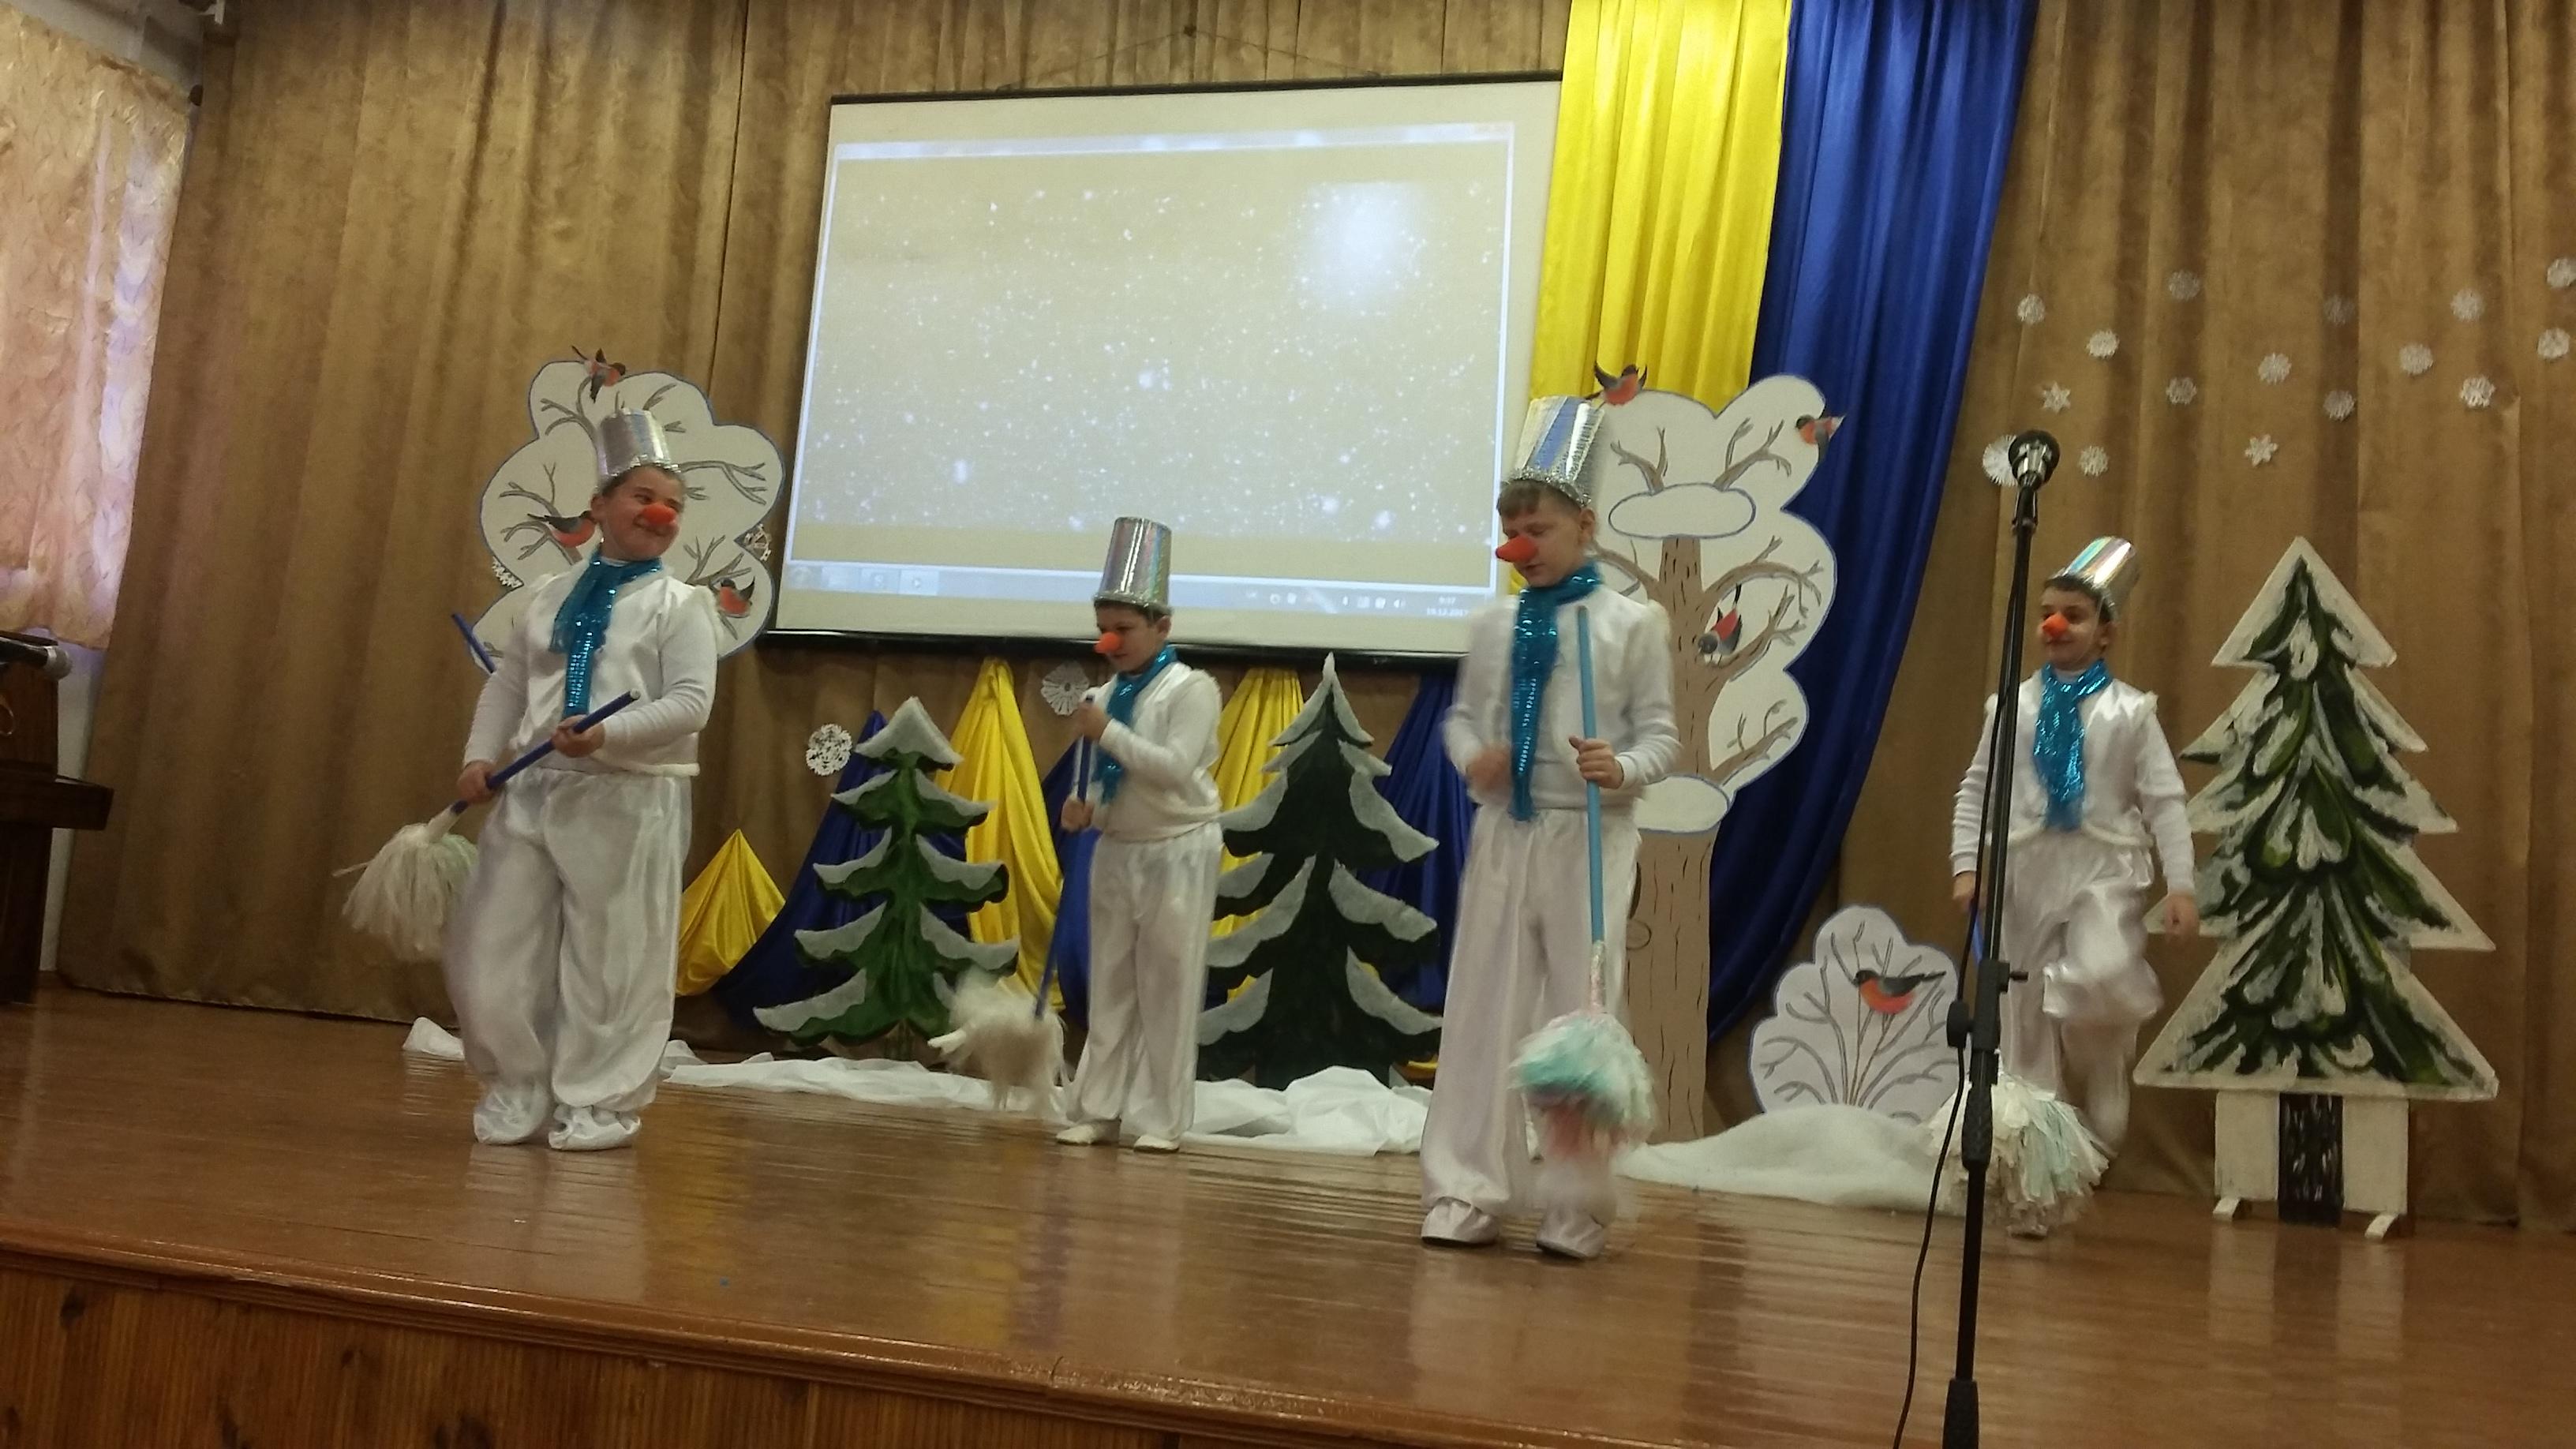 http://karl-gymnasium.at.ua/2a/20171219_093621.jpg